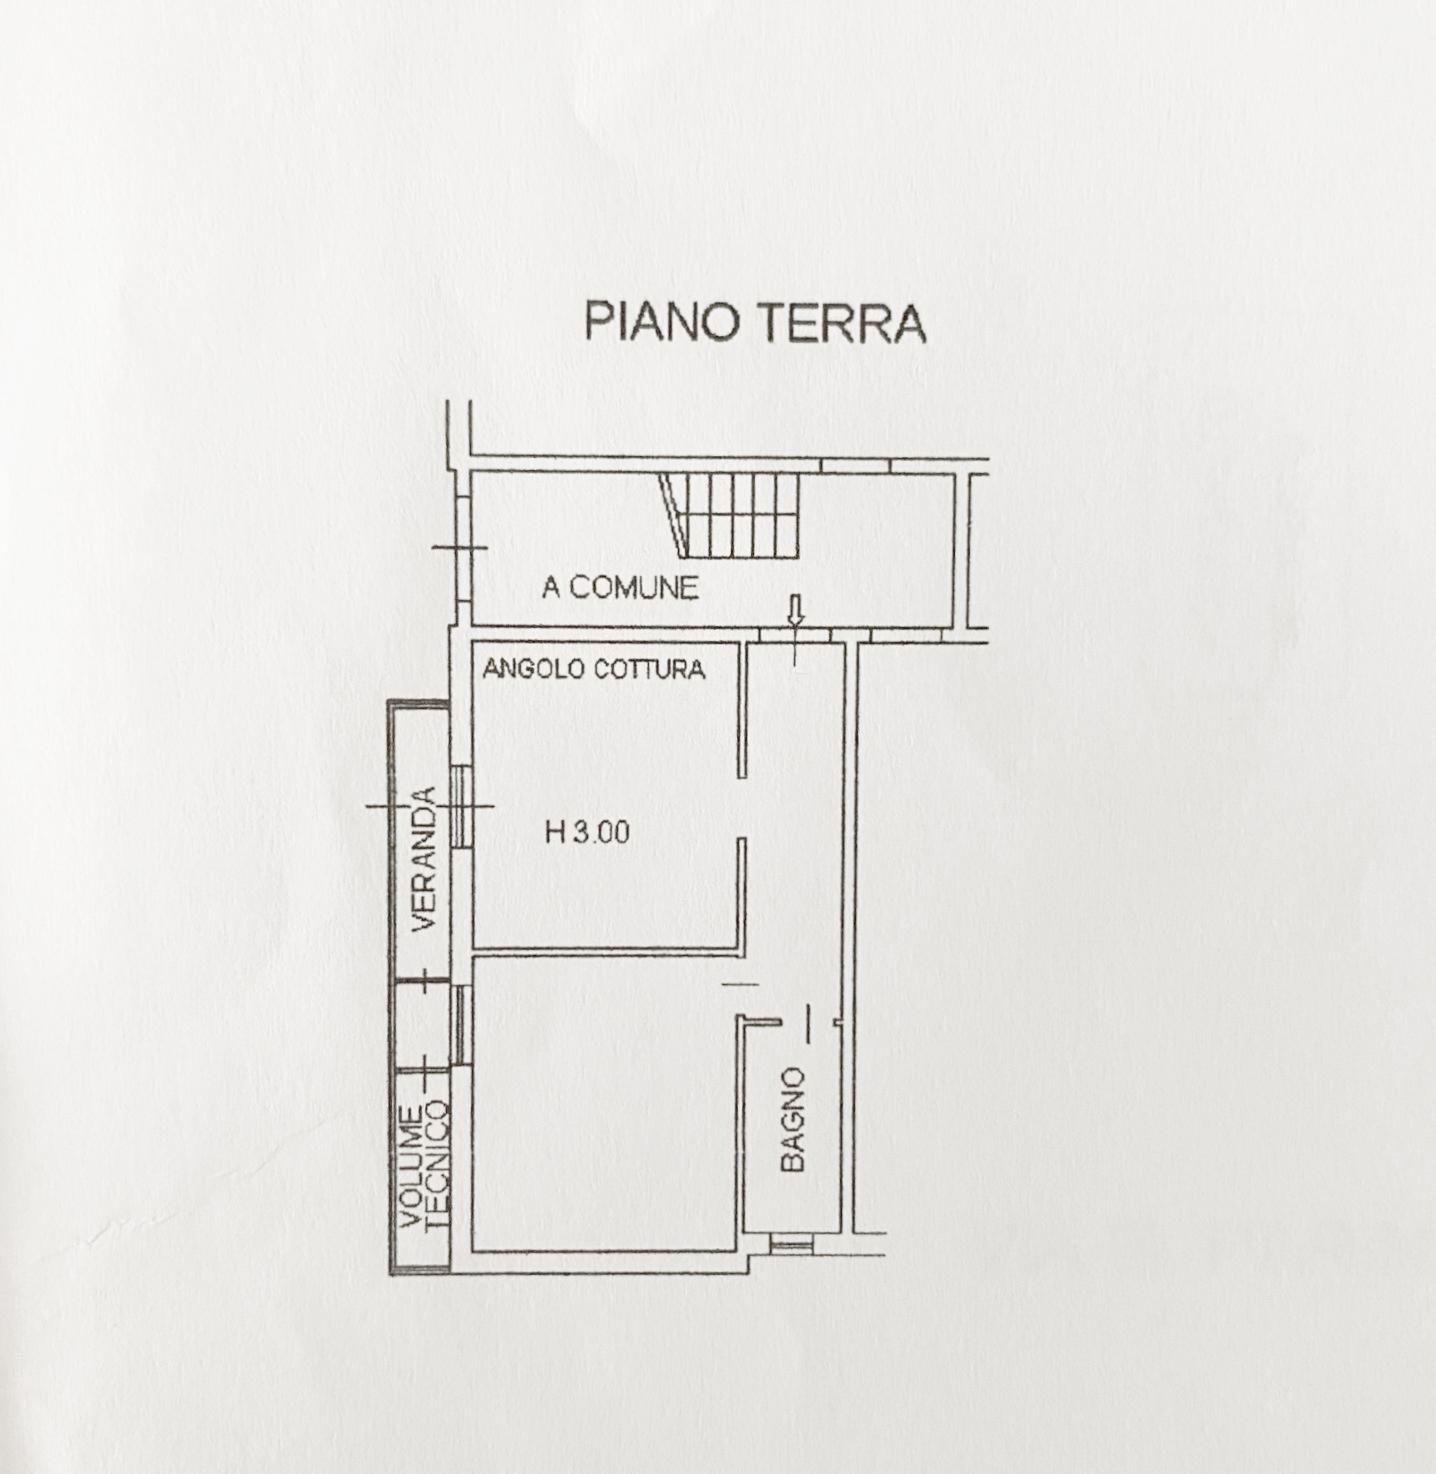 Appartamento in vendita, rif. K127 (Planimetria 1/1)